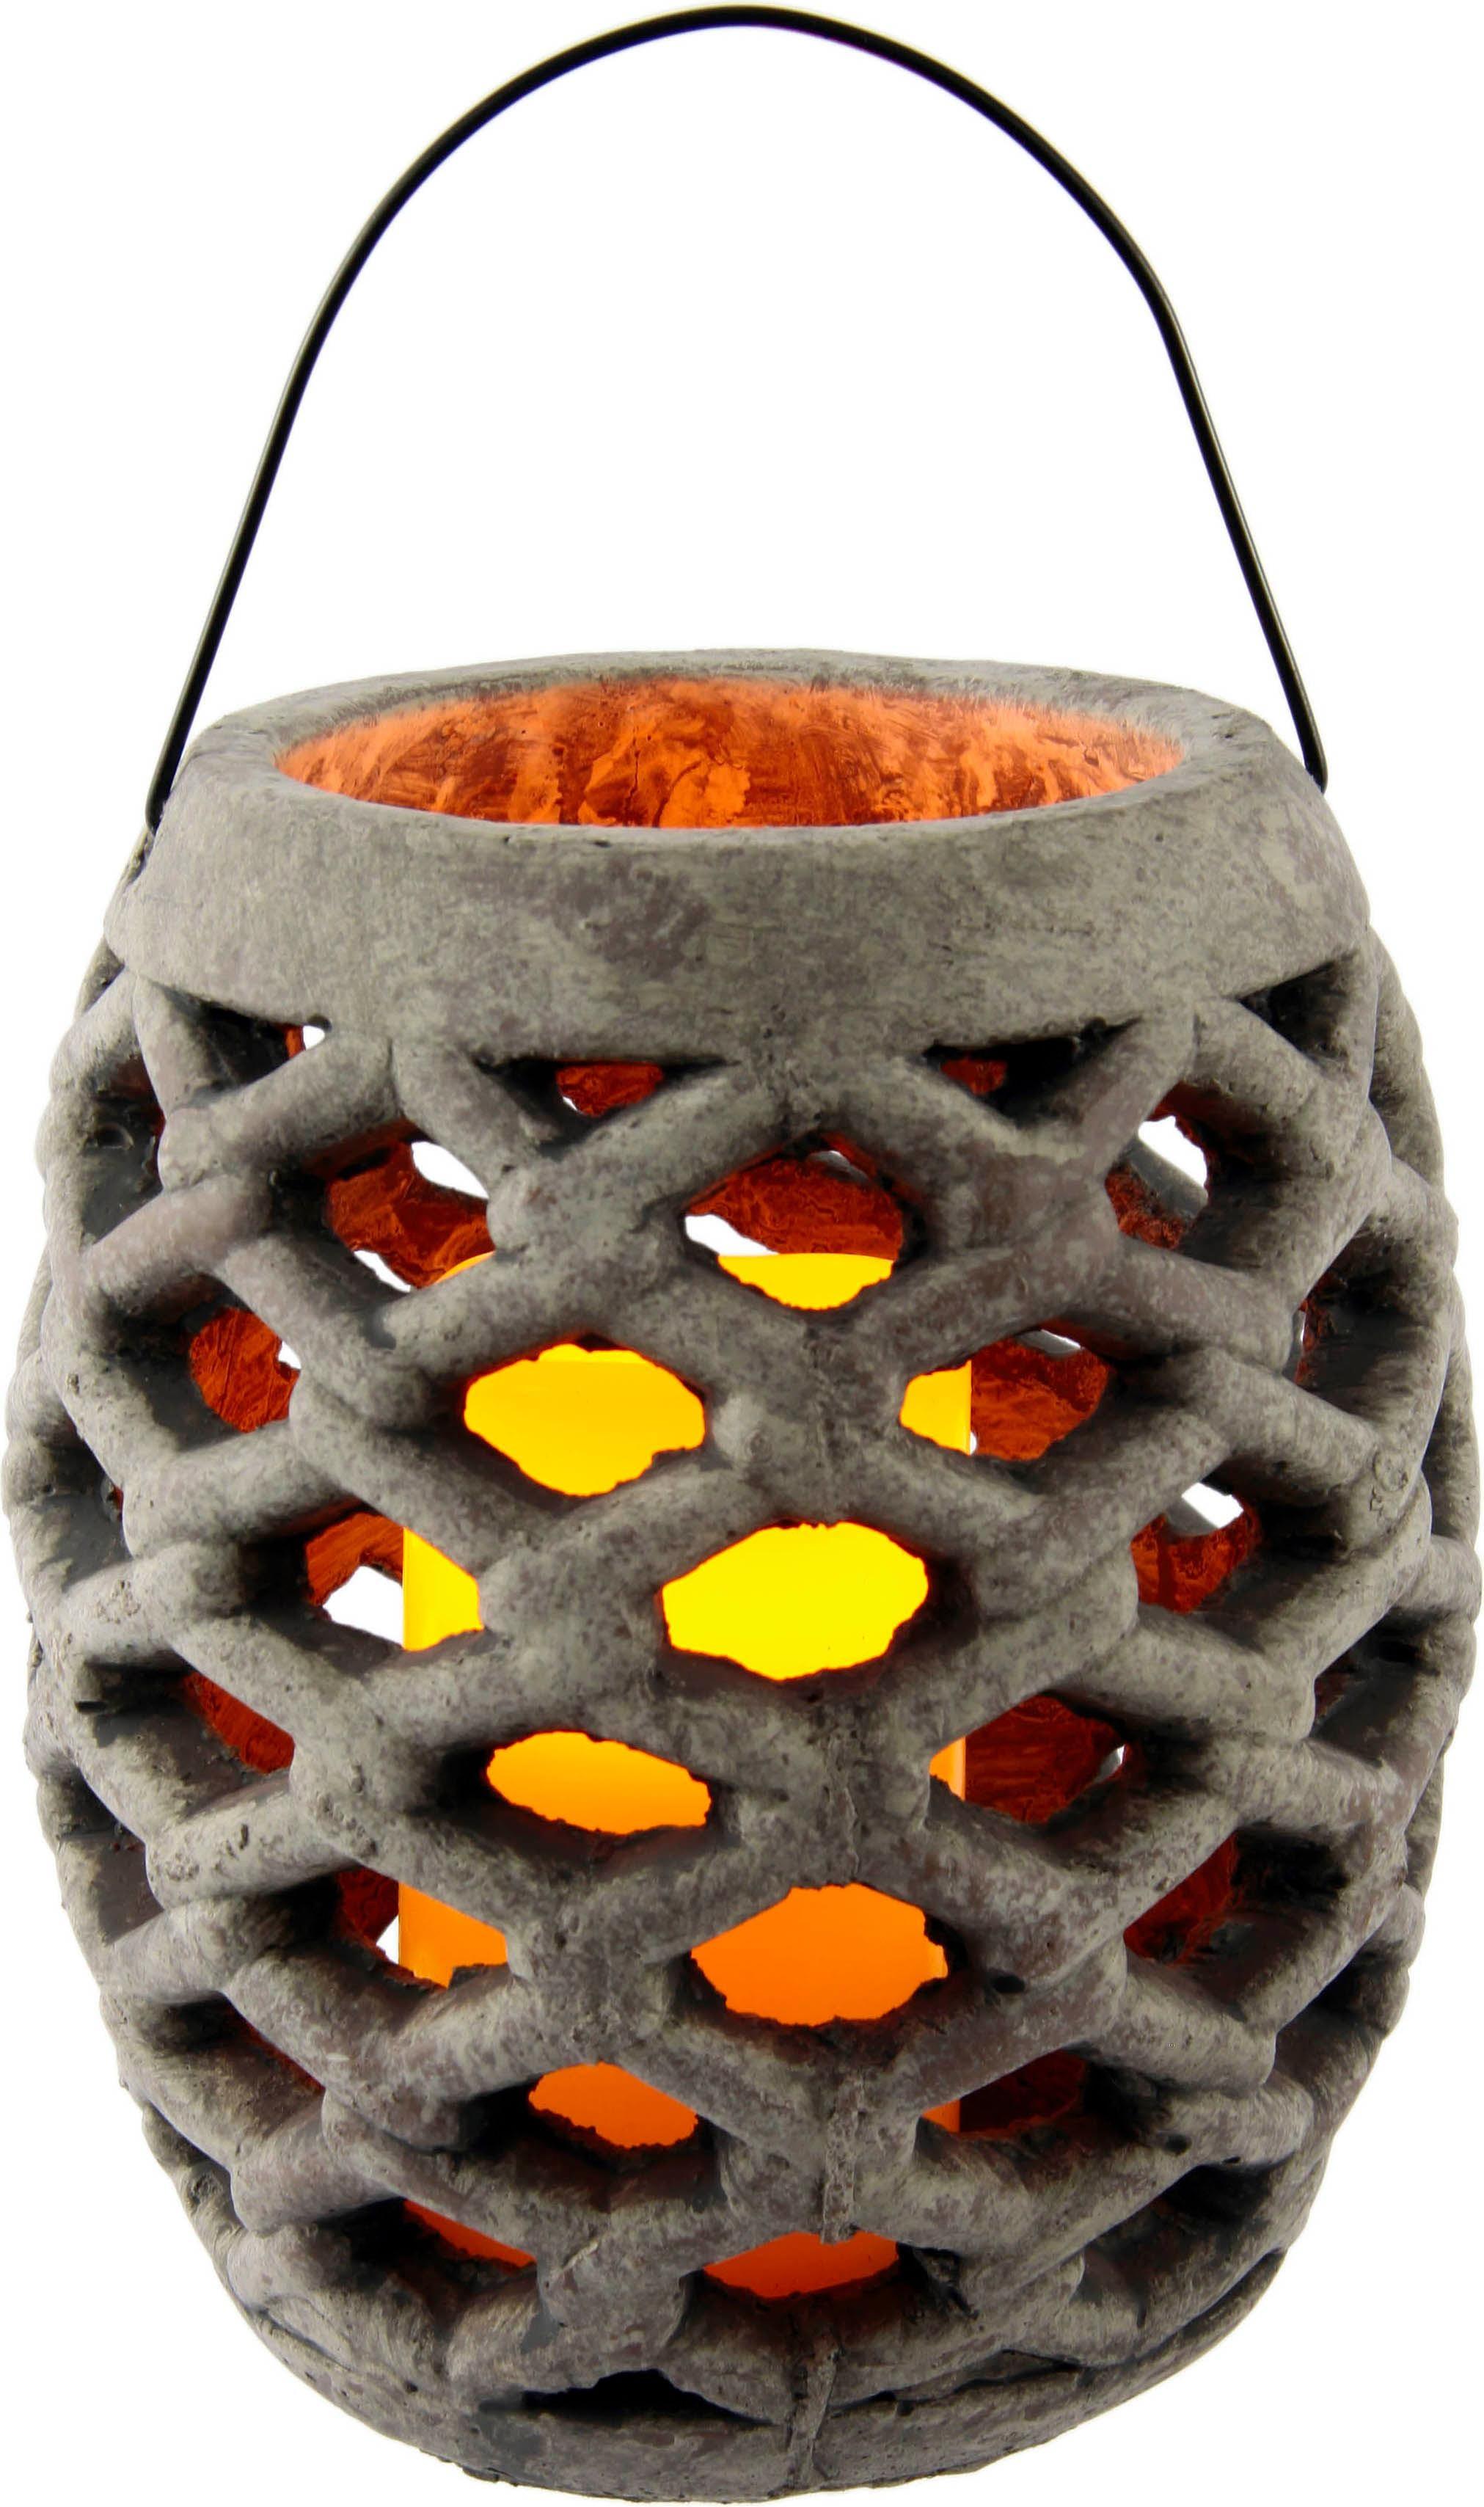 I.GE.A. Laterne Keramik Windlicht mit LED, Maße (H): 22 cm grau Kerzenhalter Kerzen Laternen Wohnaccessoires